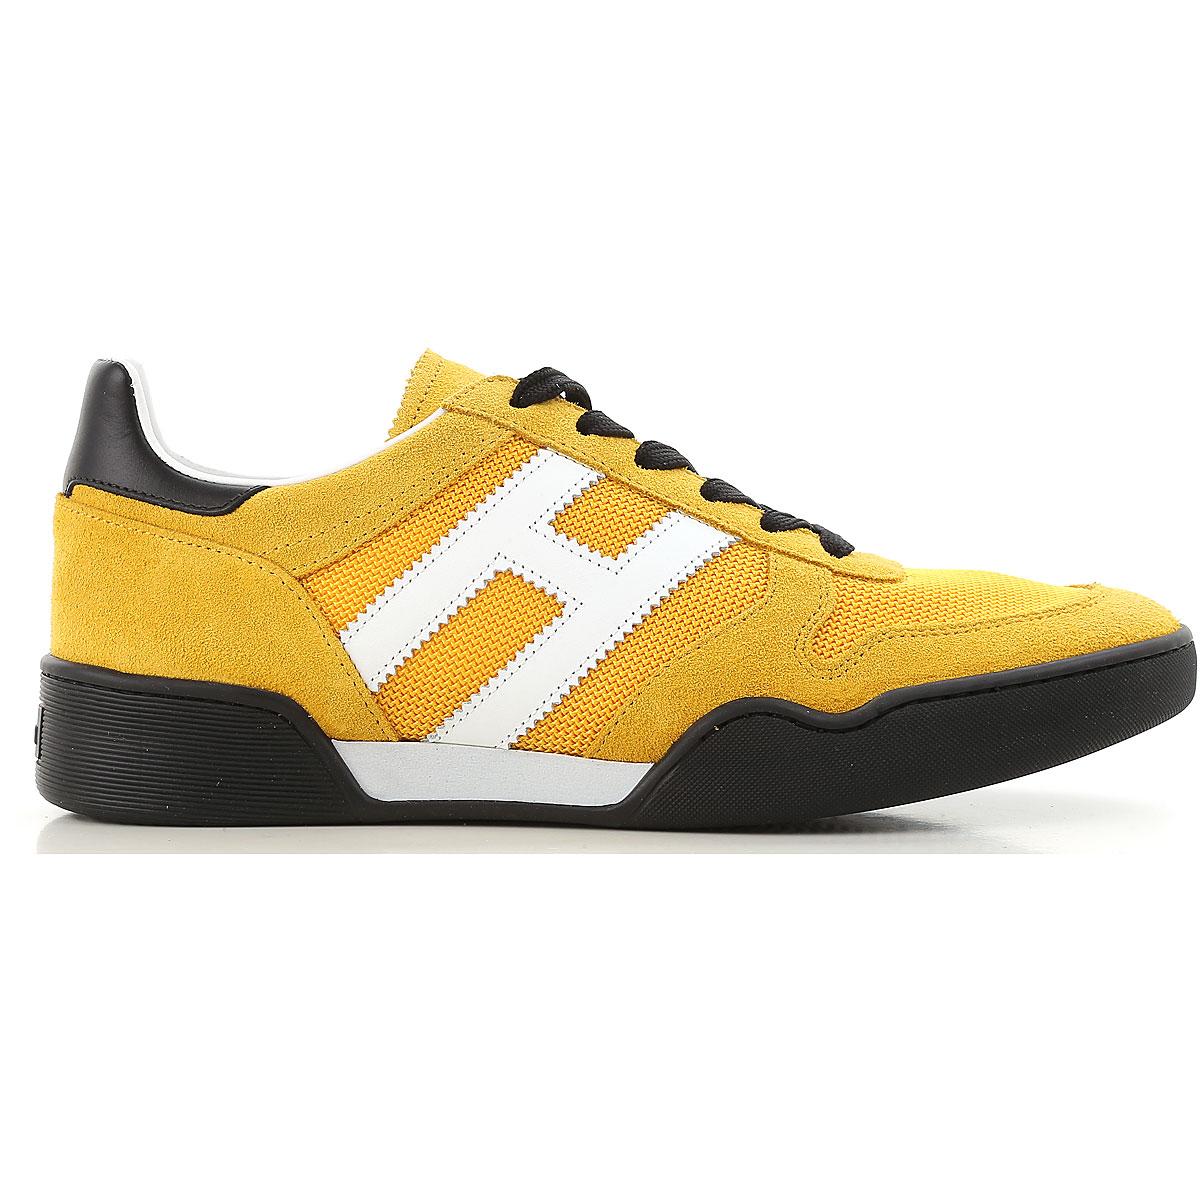 HOGAN Scarpe Uomo H357 HXM3570AC40IPJ9310 Sneaker Camoscio Giallo